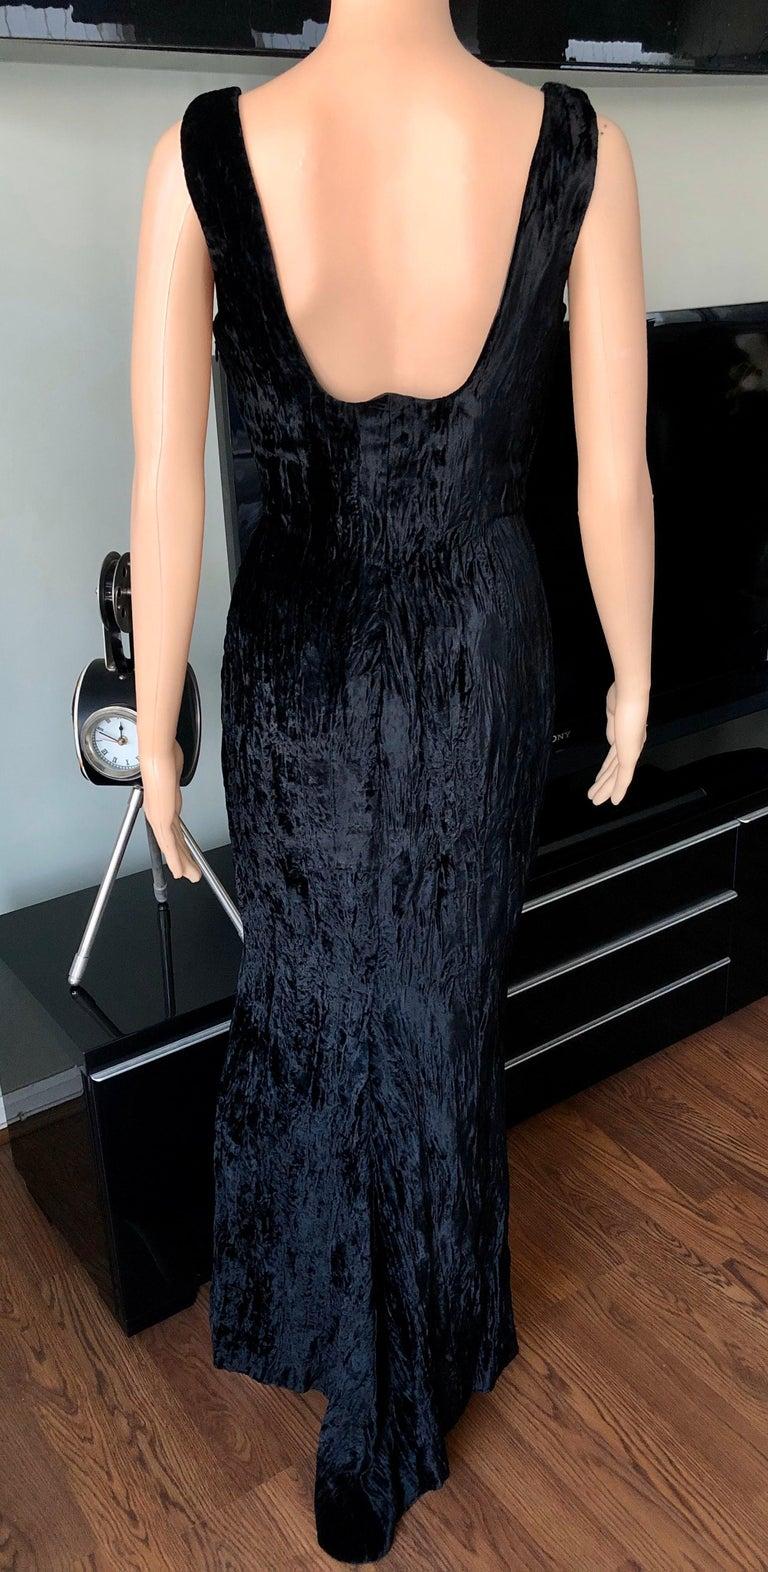 Gianni Versace F/W 1995 Runway Vintage Velvet Black Maxi Dress Gown 1